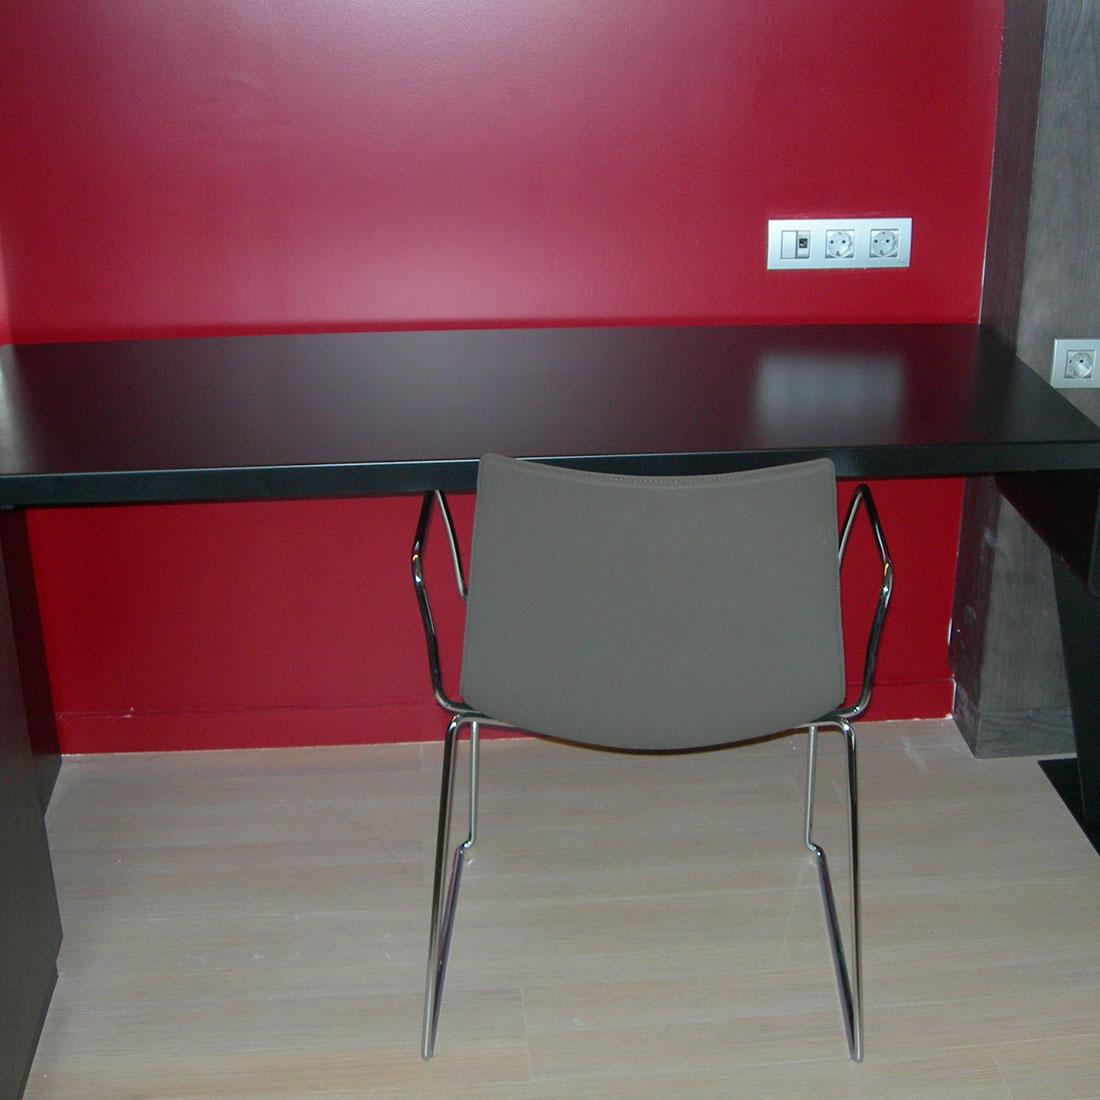 gadget-fugrup-hotel-rosello-decoracion-mesa-habitacion_02